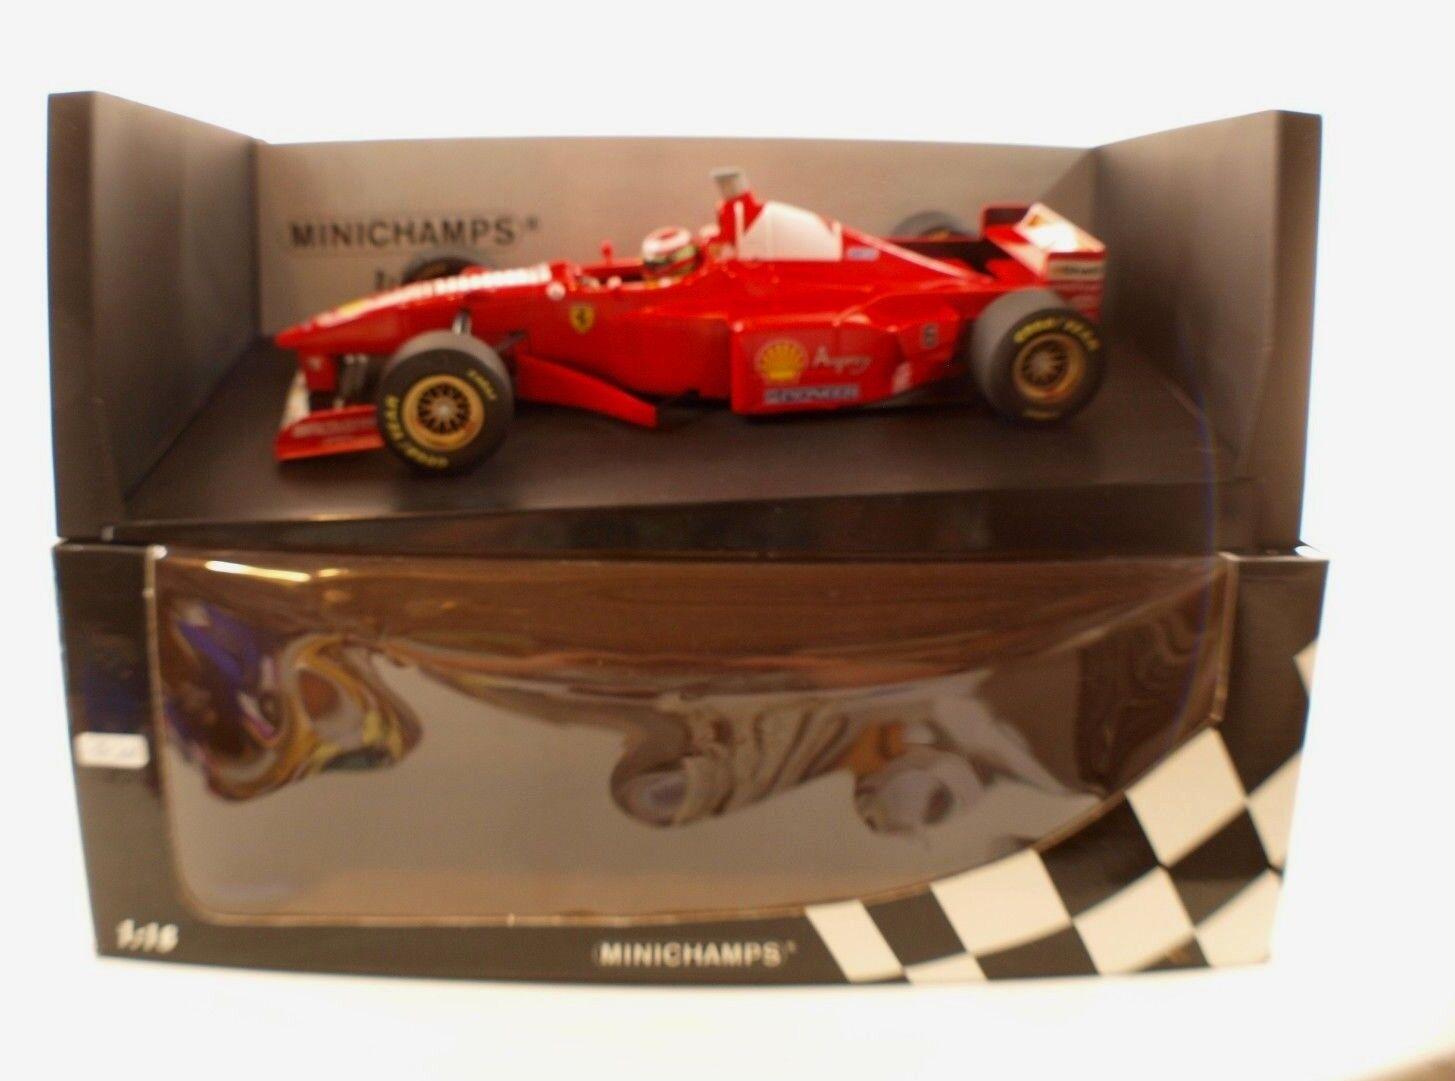 Minichamps 180 970006 F1 Ferrari F 310B Irvine #6 neuf 1/18 boxed / en boîte MIB